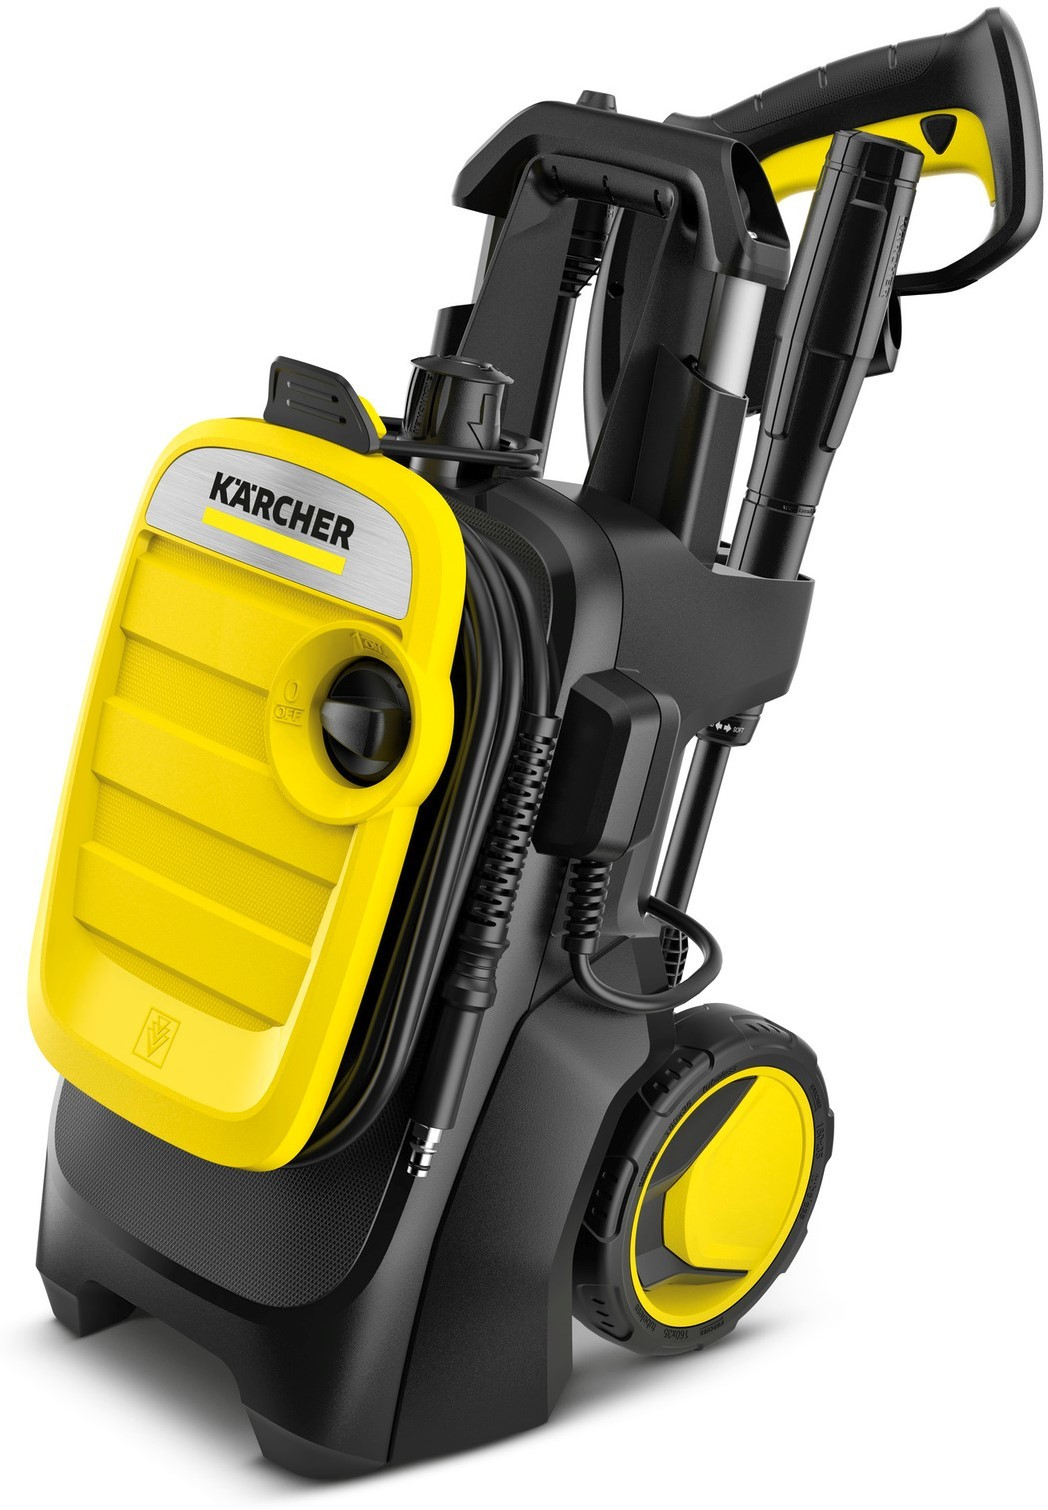 Karcher K 5 Compact 1.630-750.0